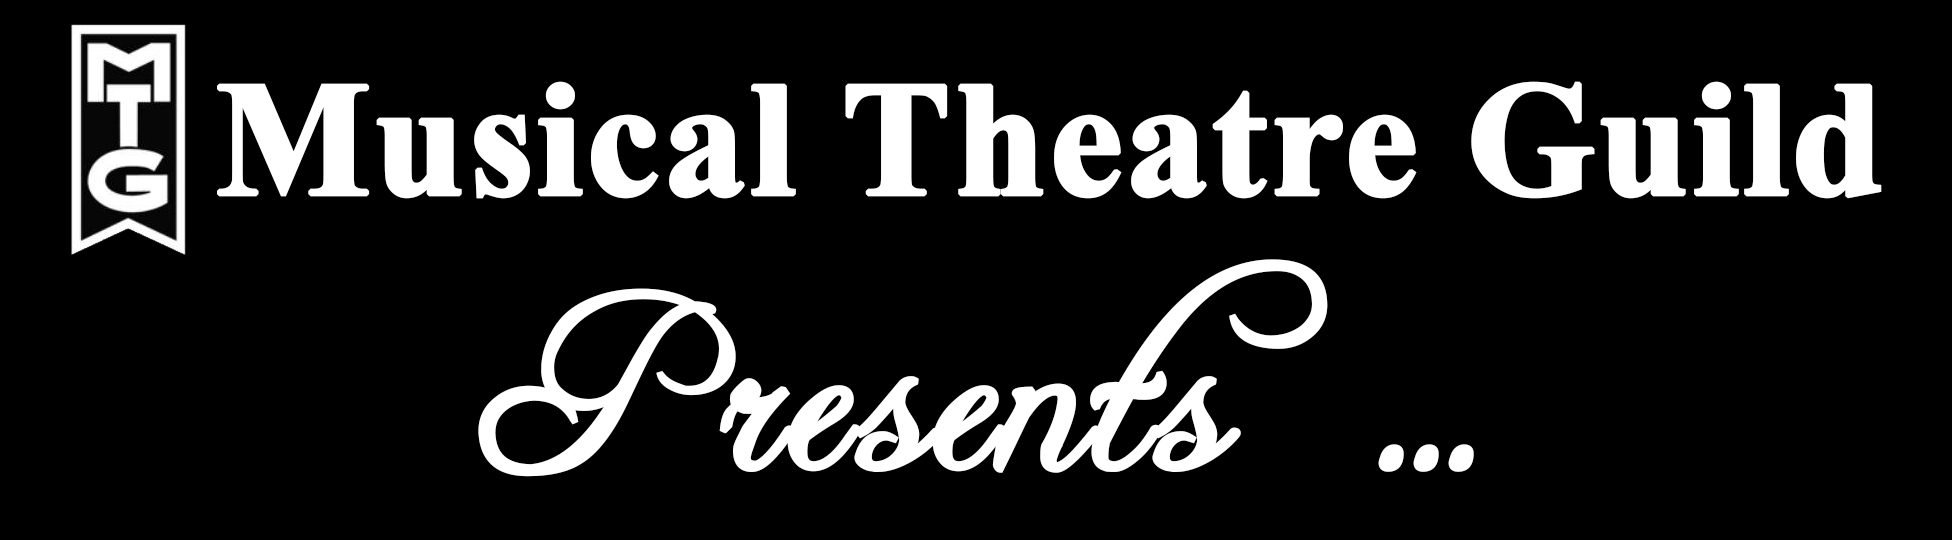 Musical Theatre Guild Presents